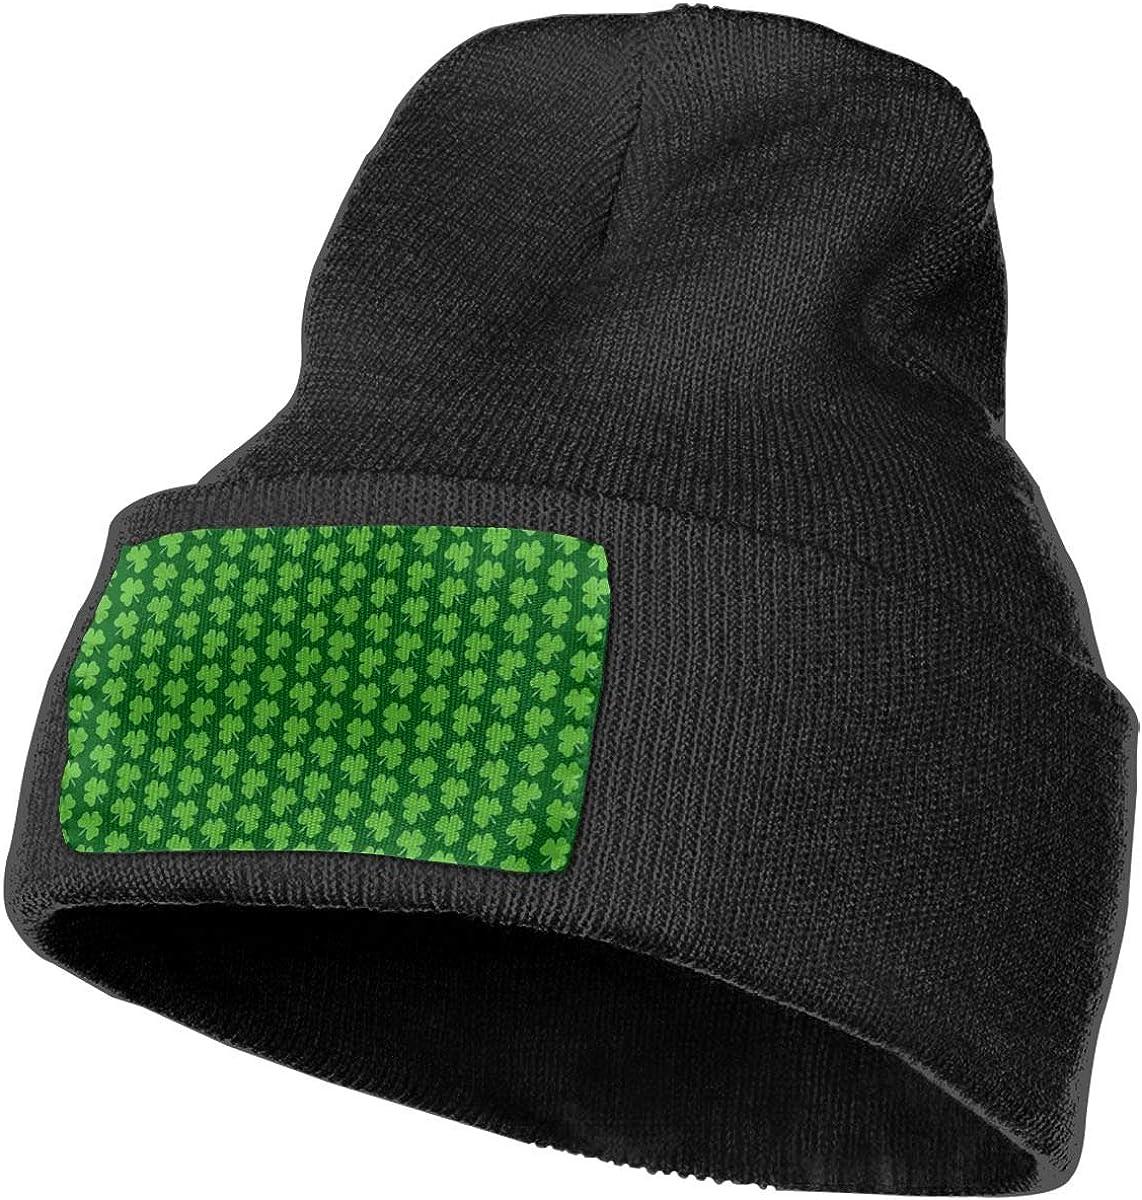 100/% Acrylic Acid Mas Beanie Hat Ruin Clover Fashion Knitting Hat for Men Women